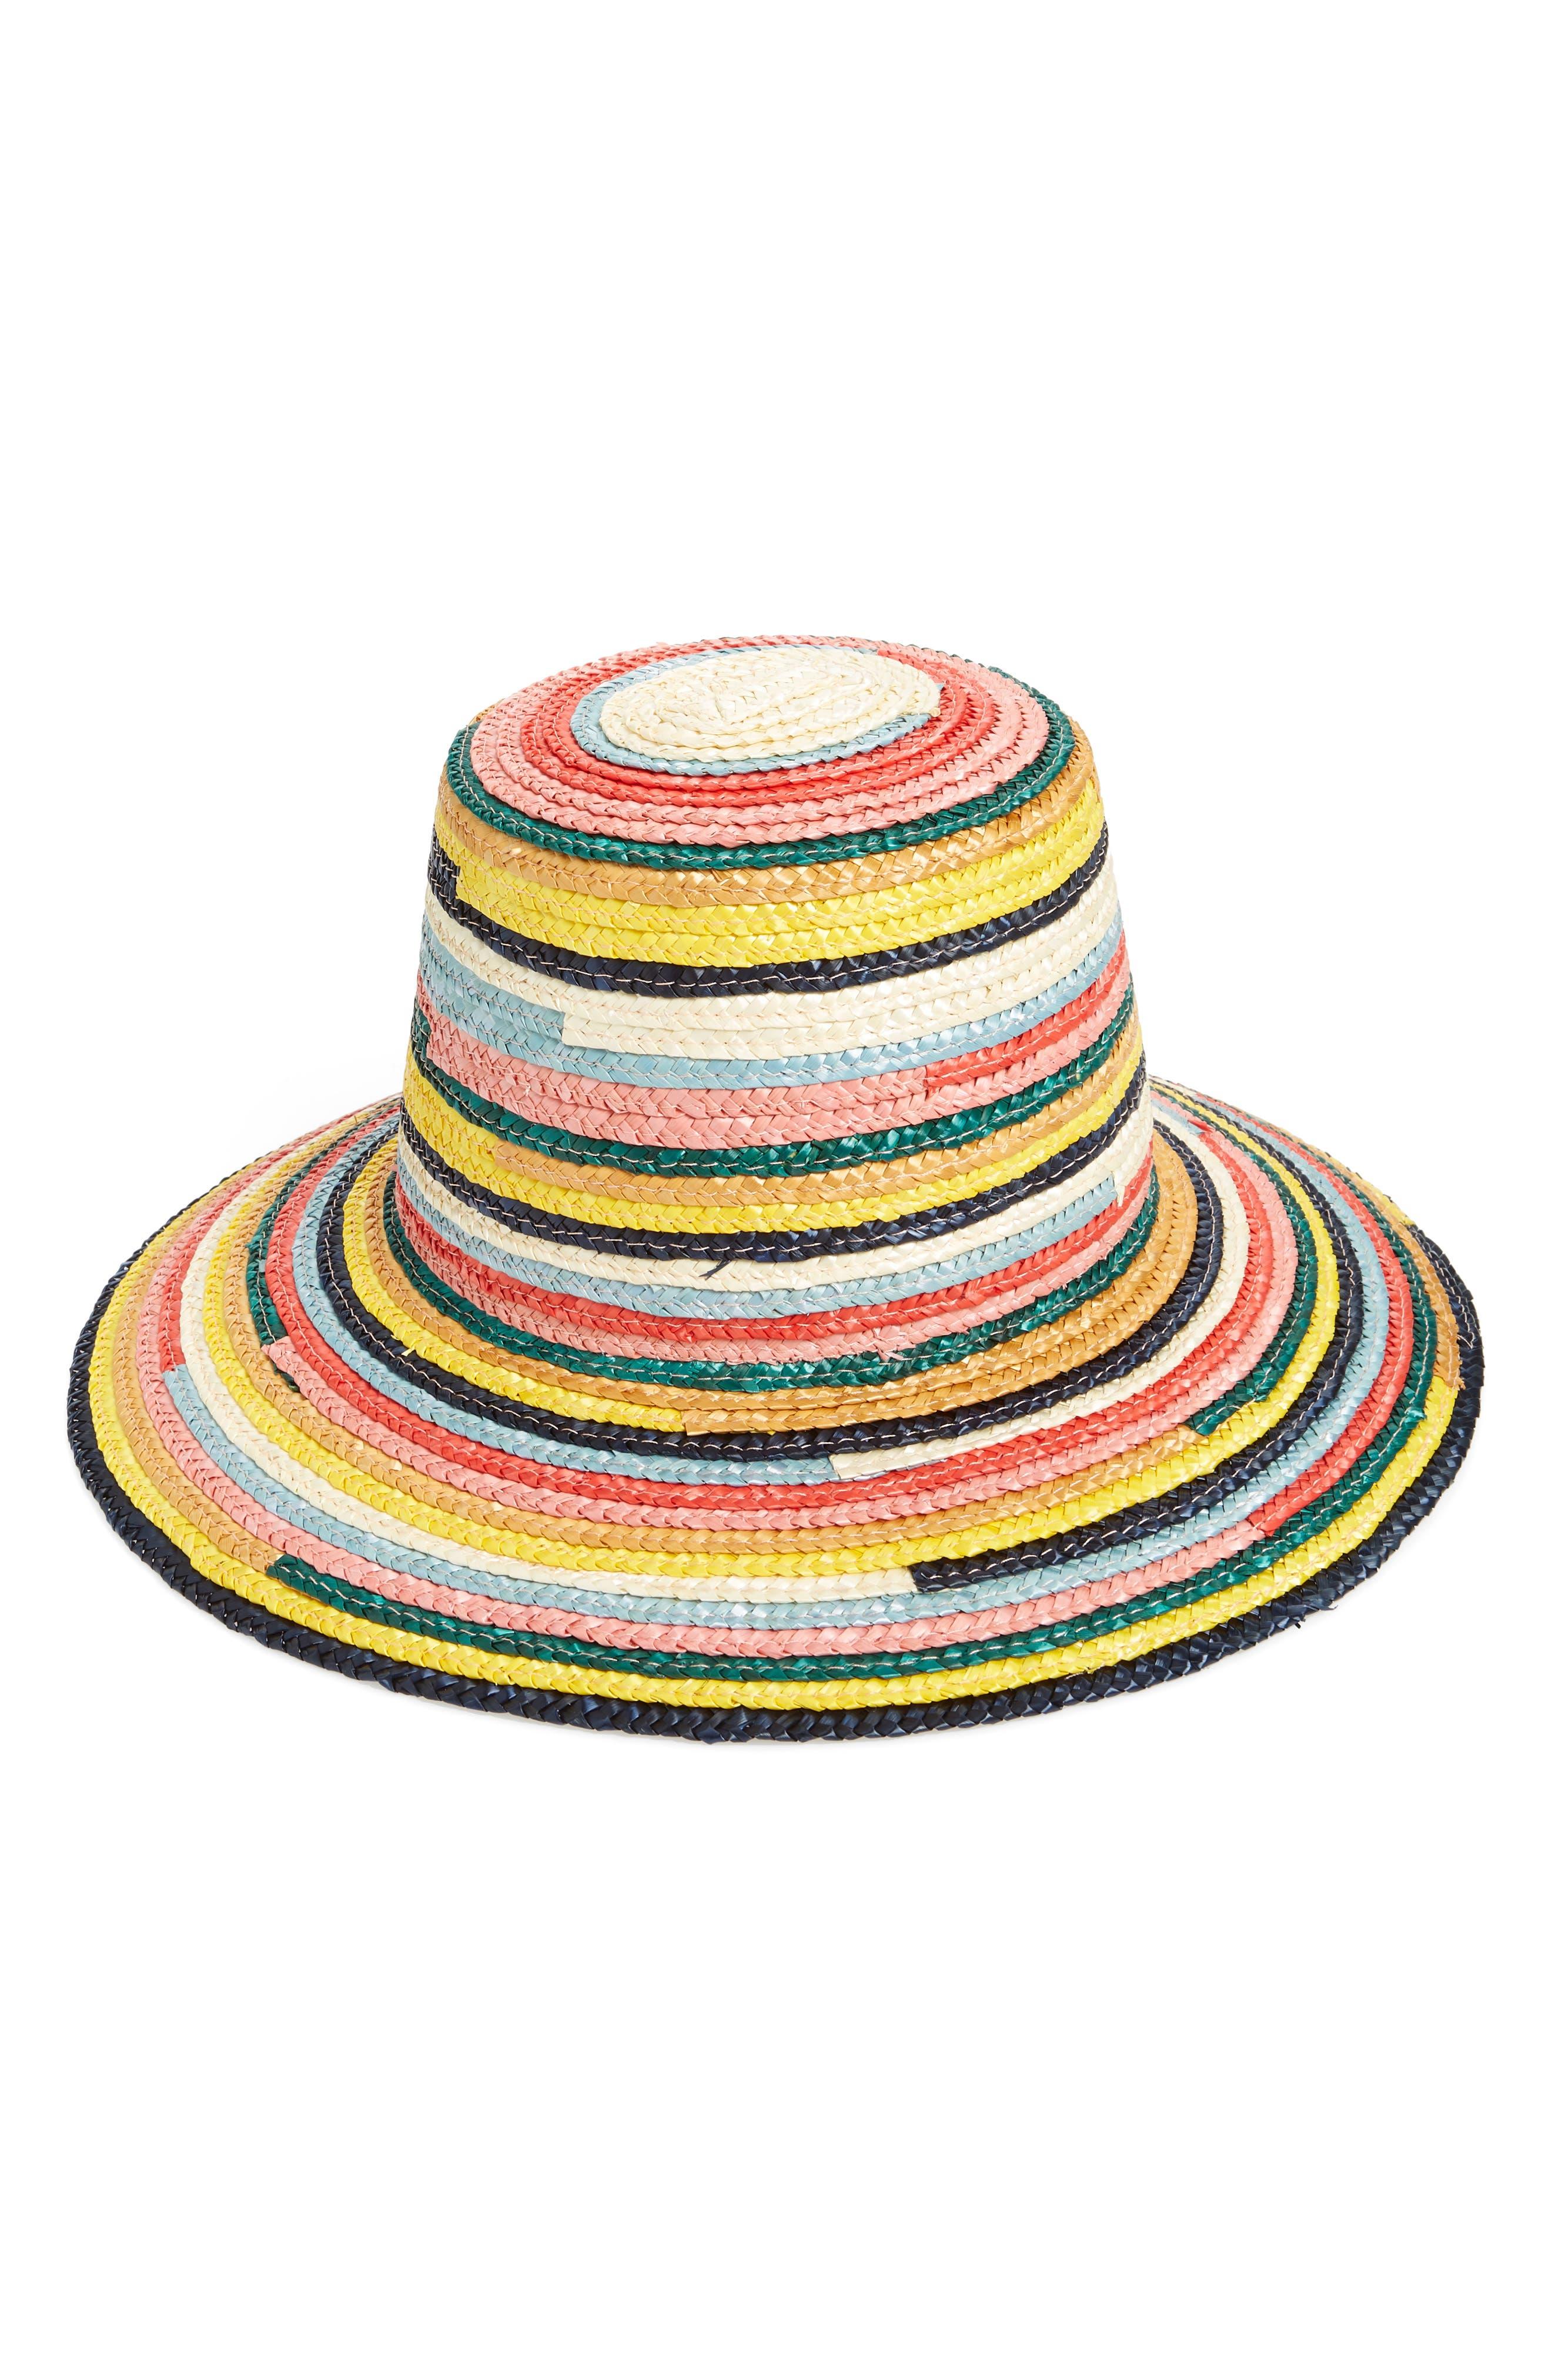 EUGENIA KIM, Stevie Straw Hat, Main thumbnail 1, color, MULTI